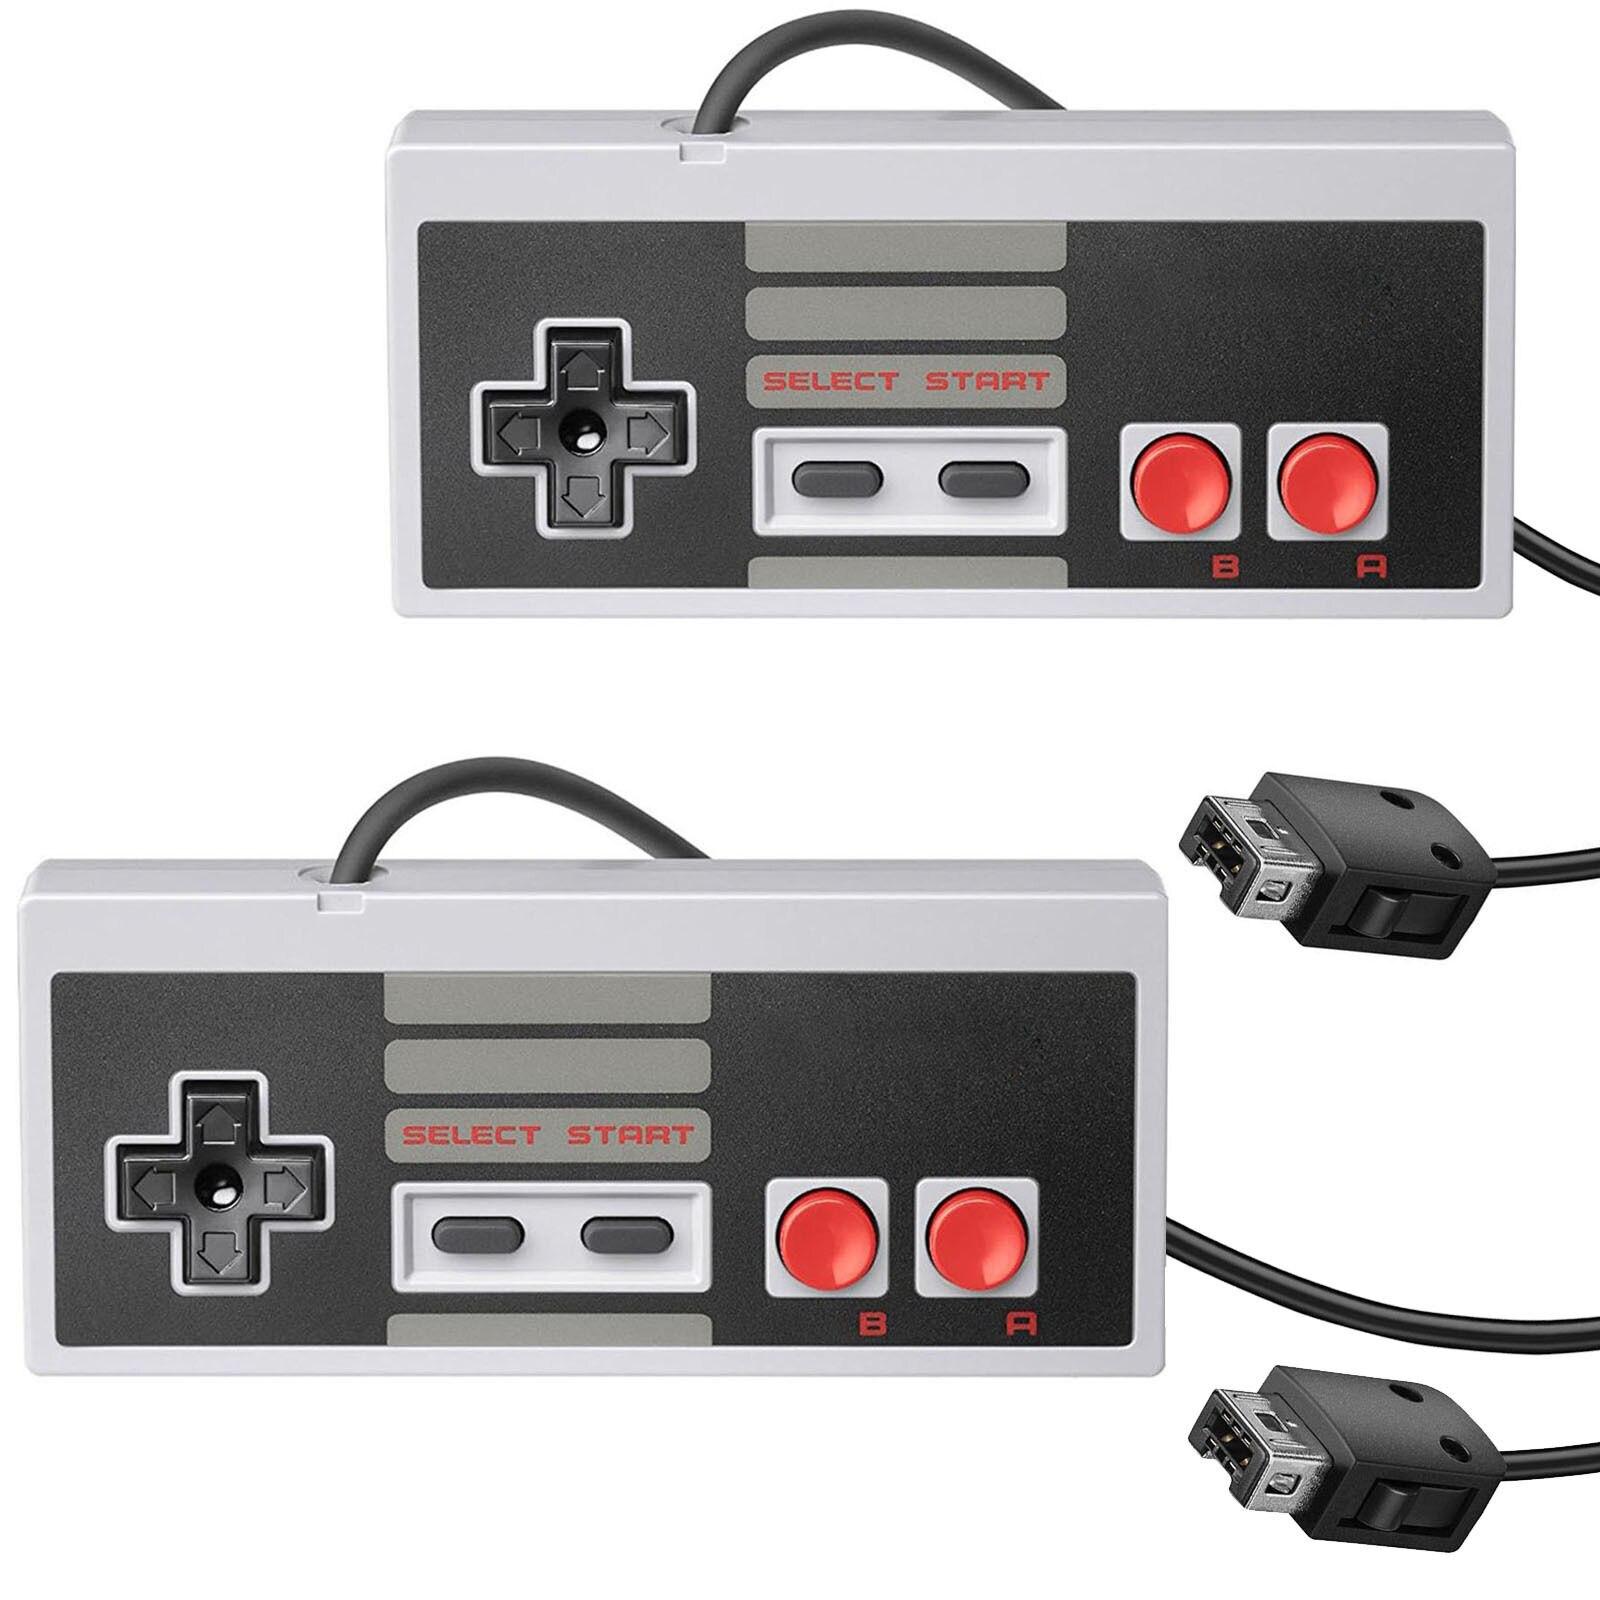 2 Pack Controller Für Nes-004 Original Nintendo Nes Vintage Konsole Verdrahtete Gamepd